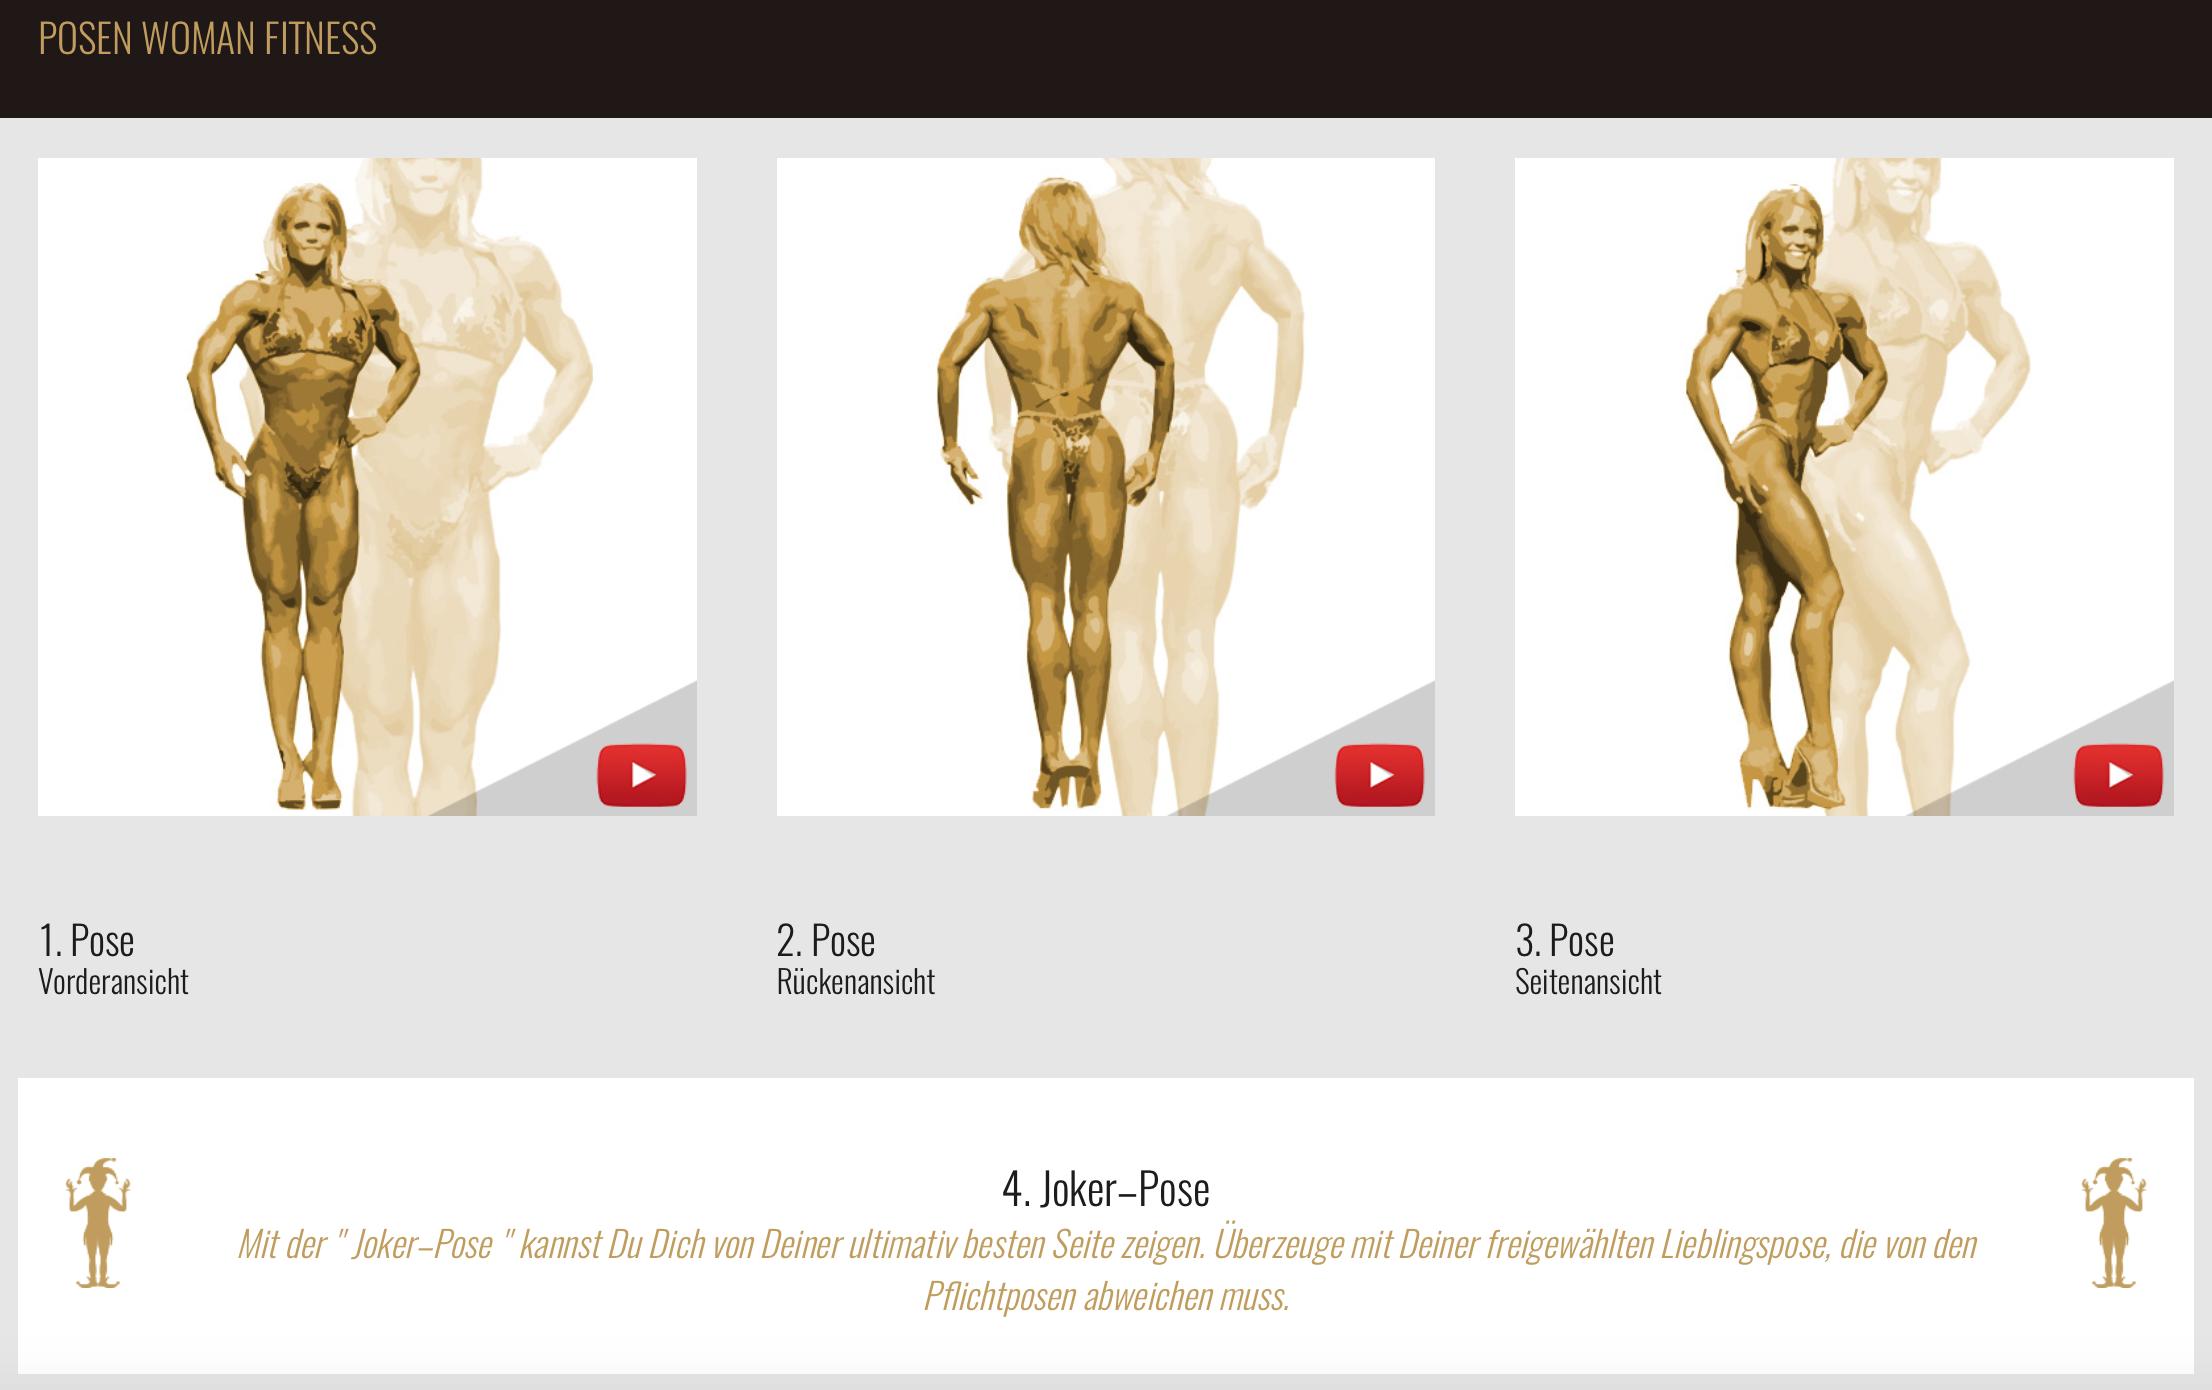 Deutschlands Bester Bodybuilder Veranstaltet 1. Online